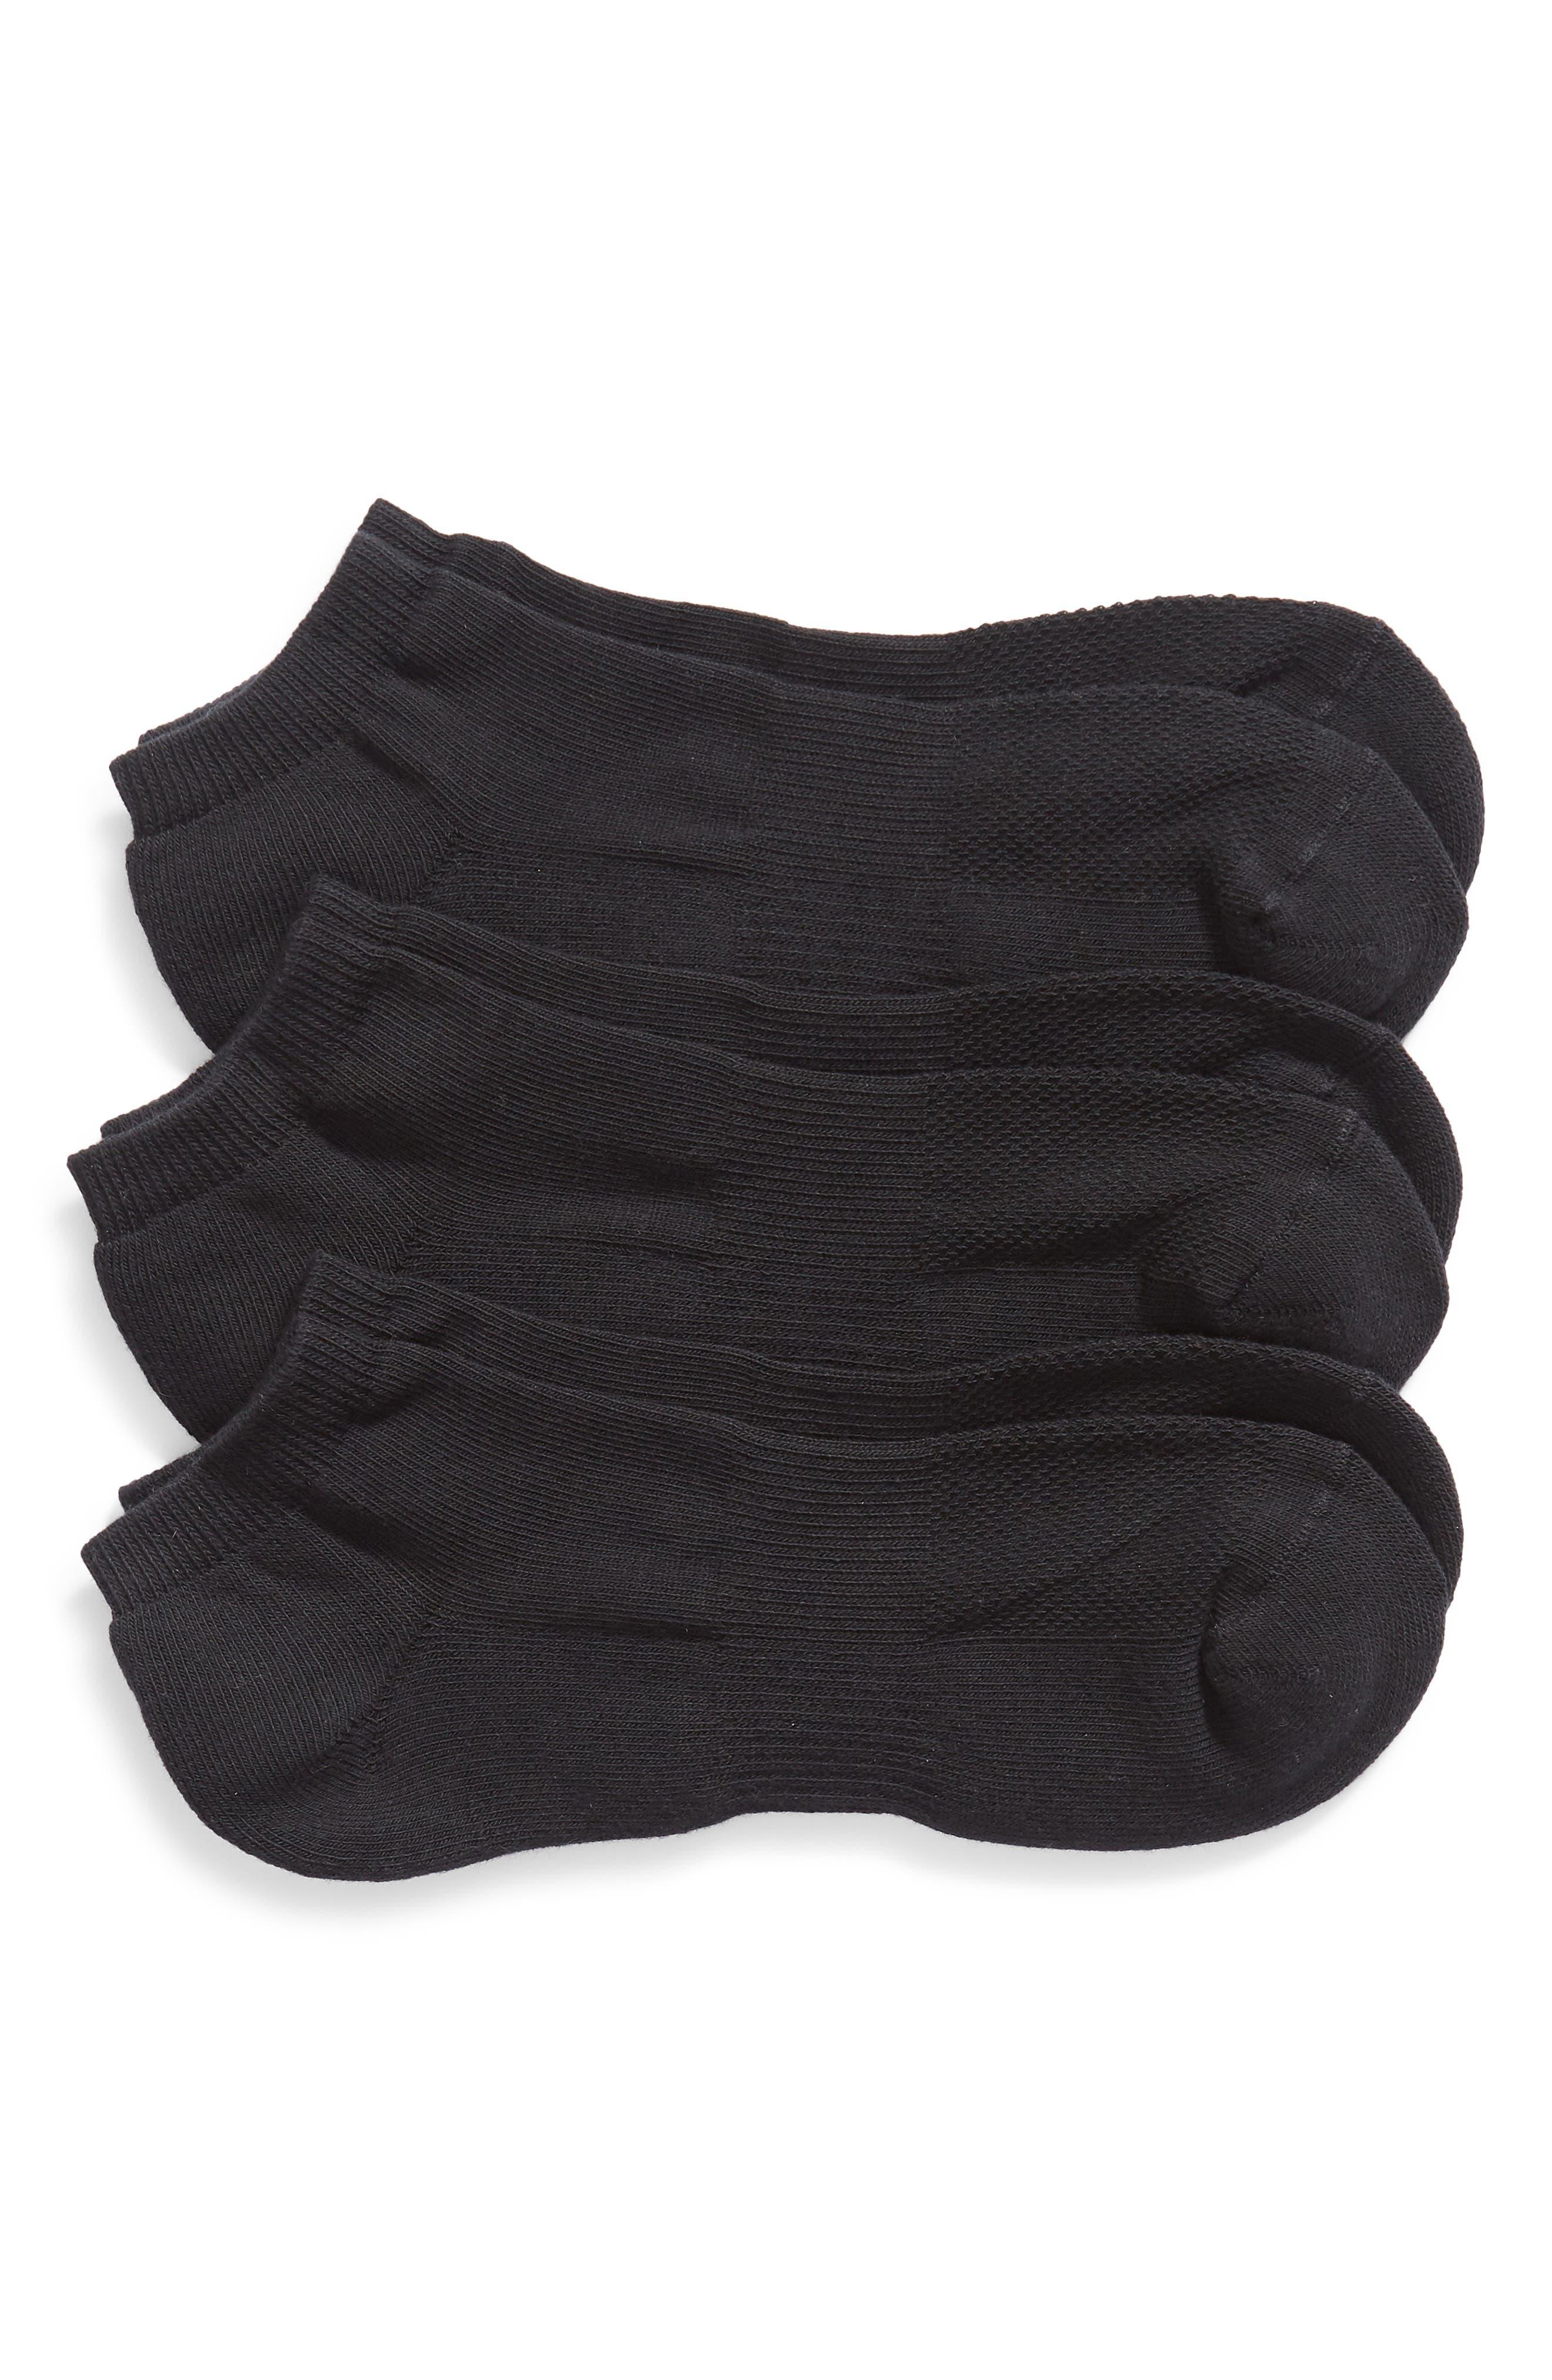 Image of Nordstrom Ankle Socks - 3 Pack